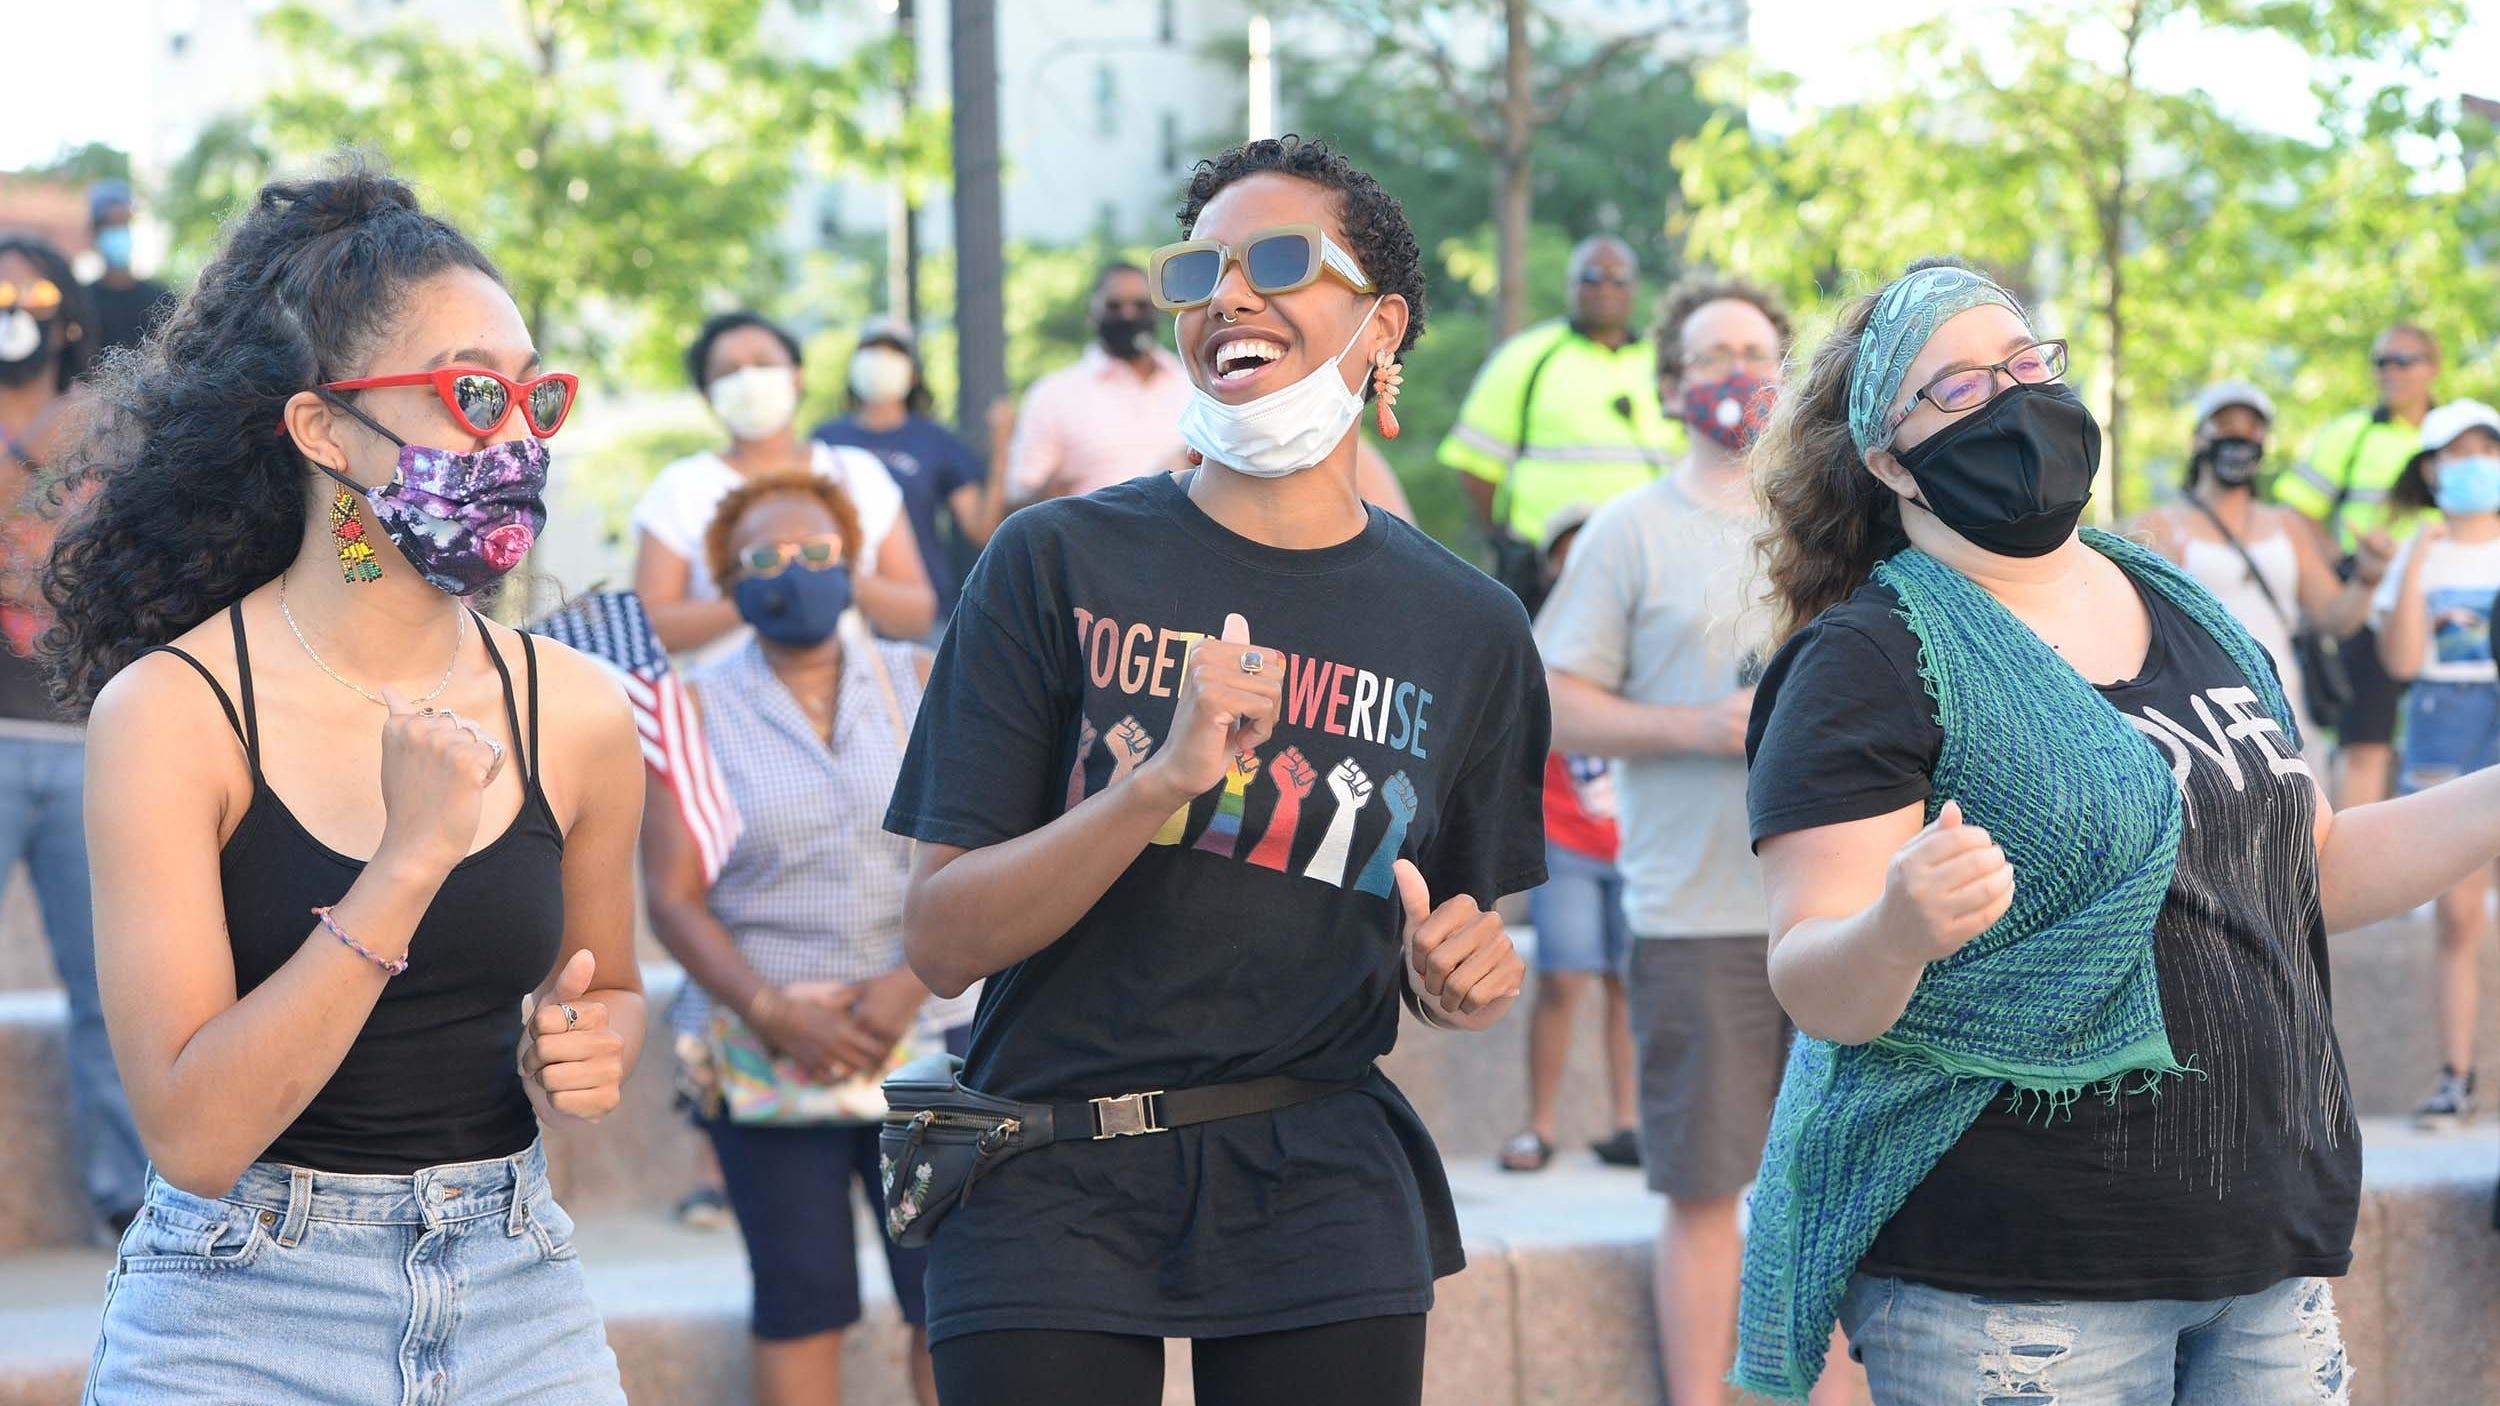 Women celebrate Juneteenth outside a city hall.